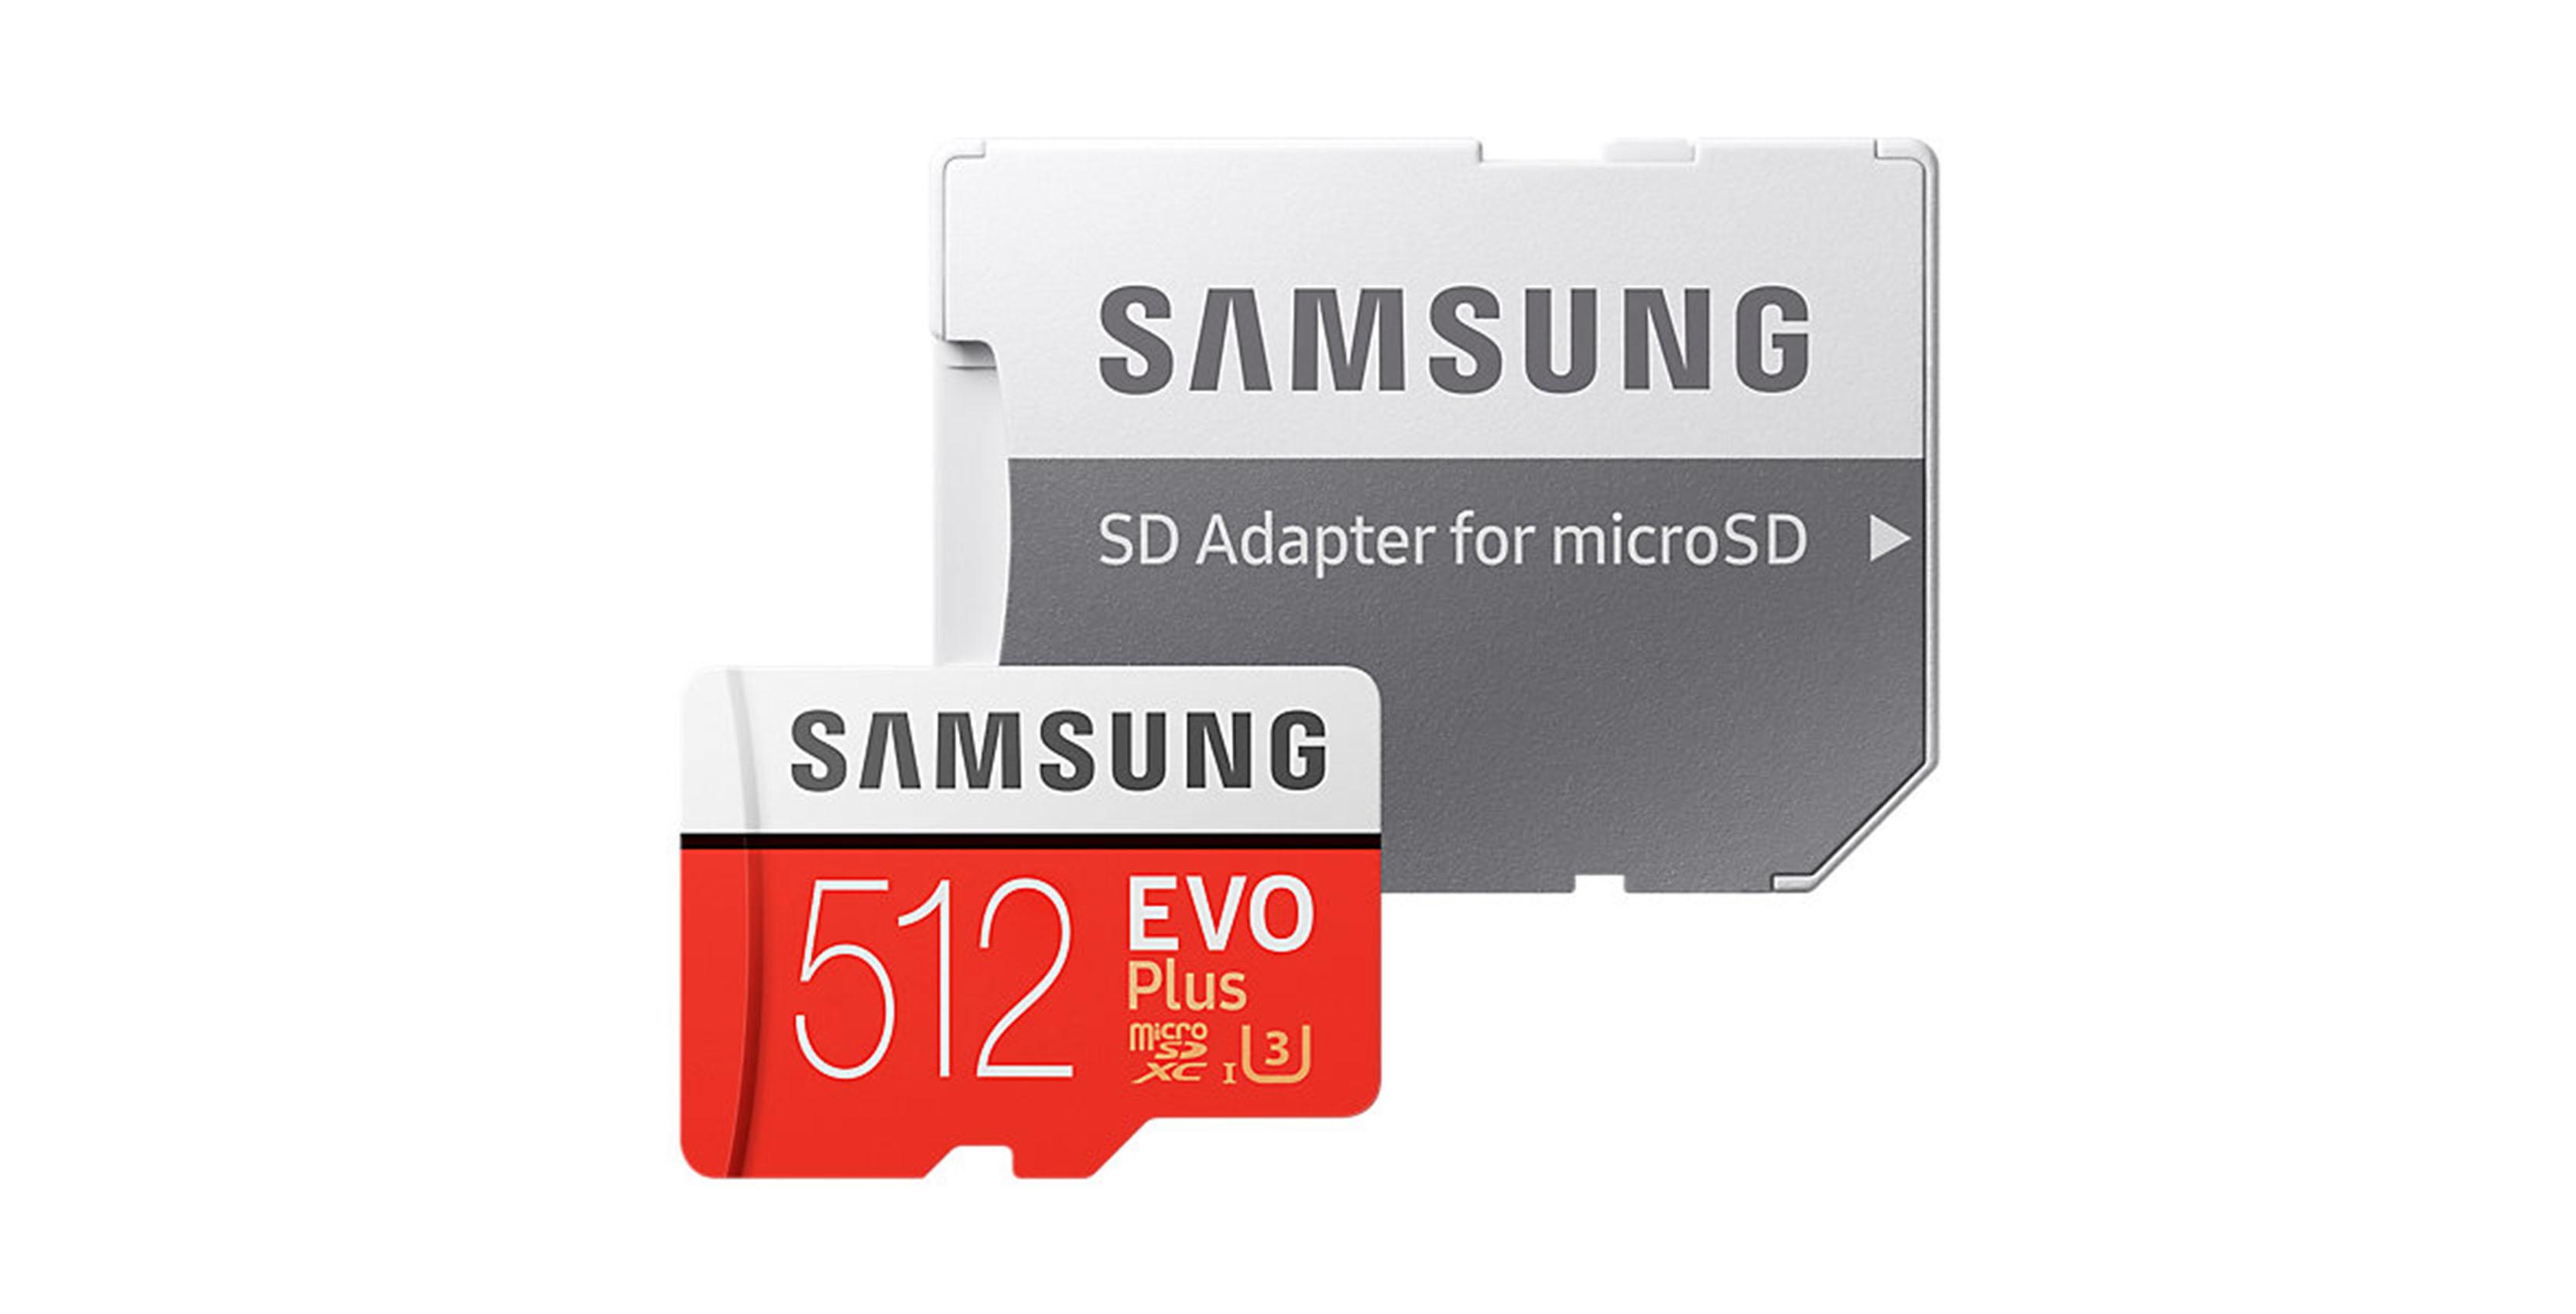 Samsung 512GB microSD